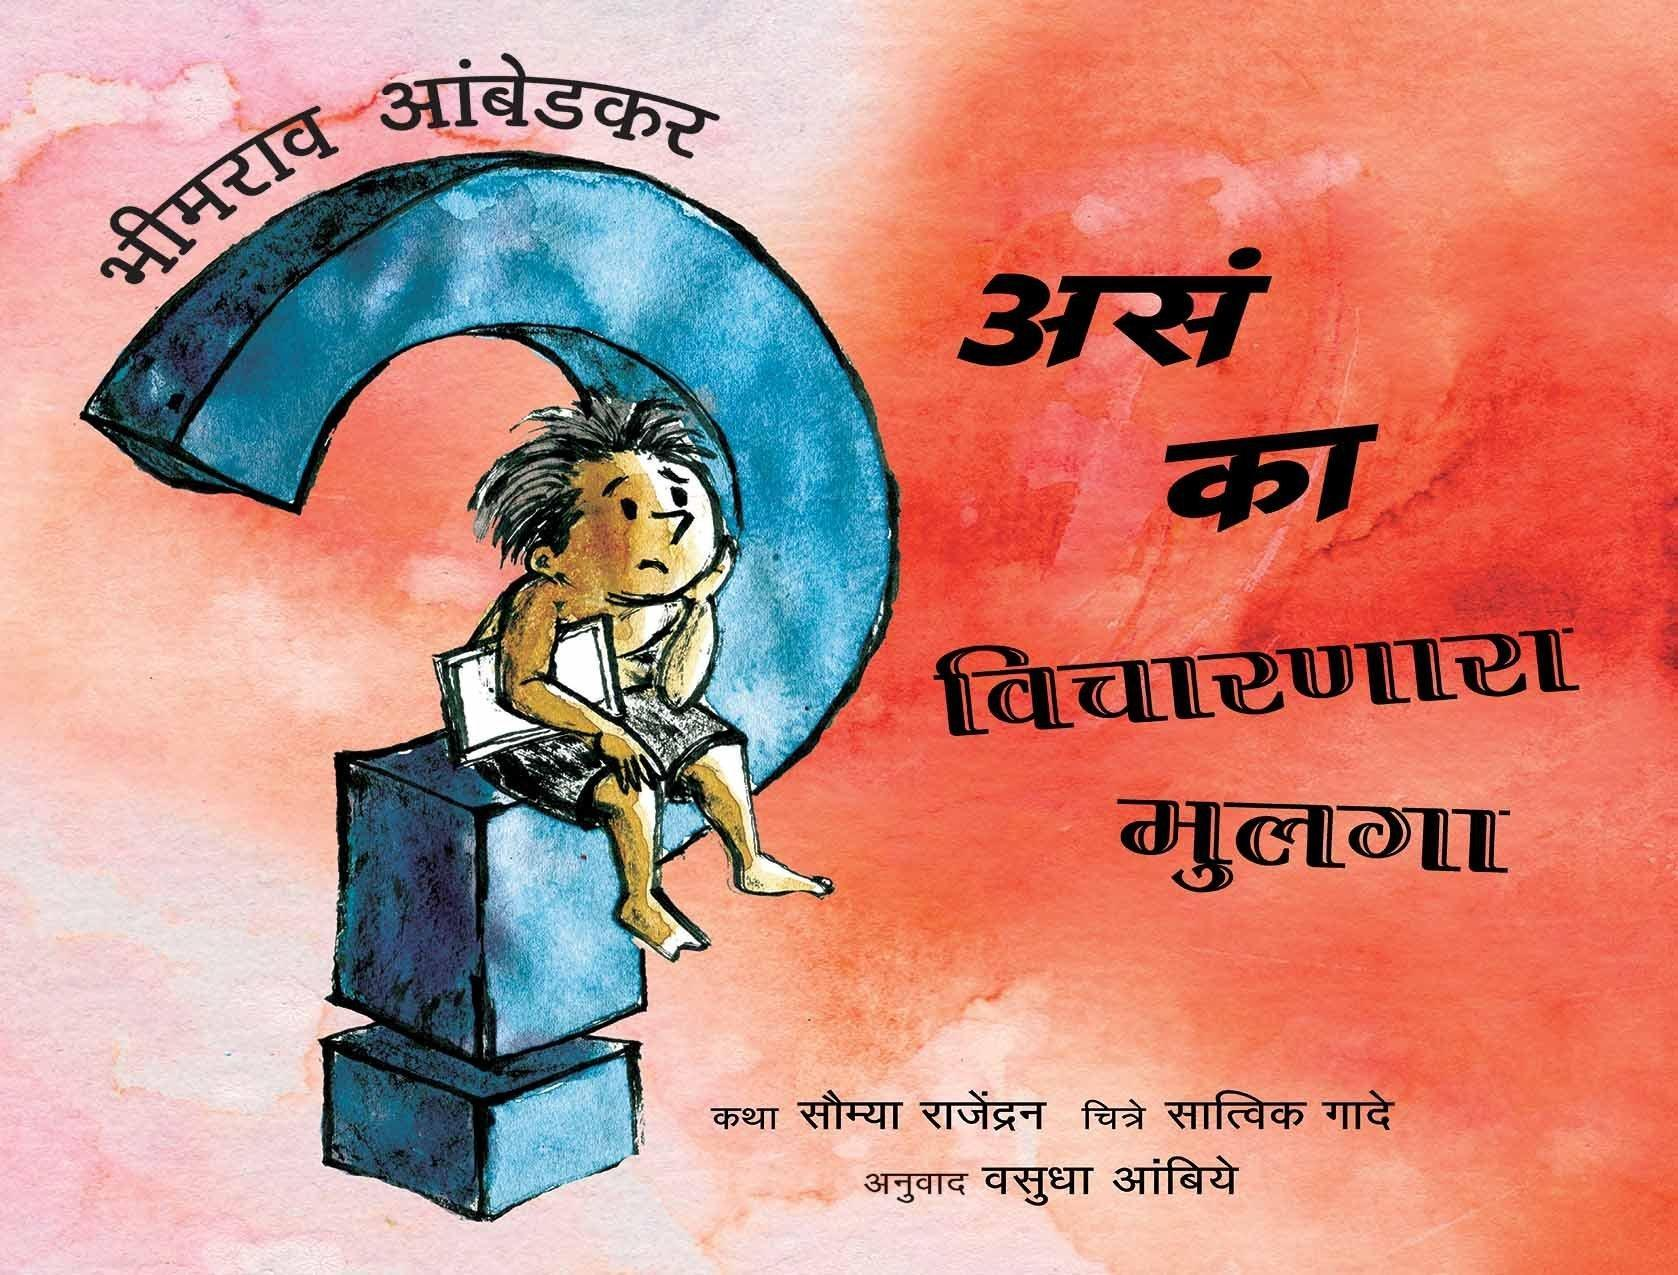 Bhimrao Ambedkar: The boy who asked why/Bhimrao Ambedkar: Asa Kaa Vicharnara Mulaga (Marathi) Picture Books Age_6+ ISBN: 9789350466902